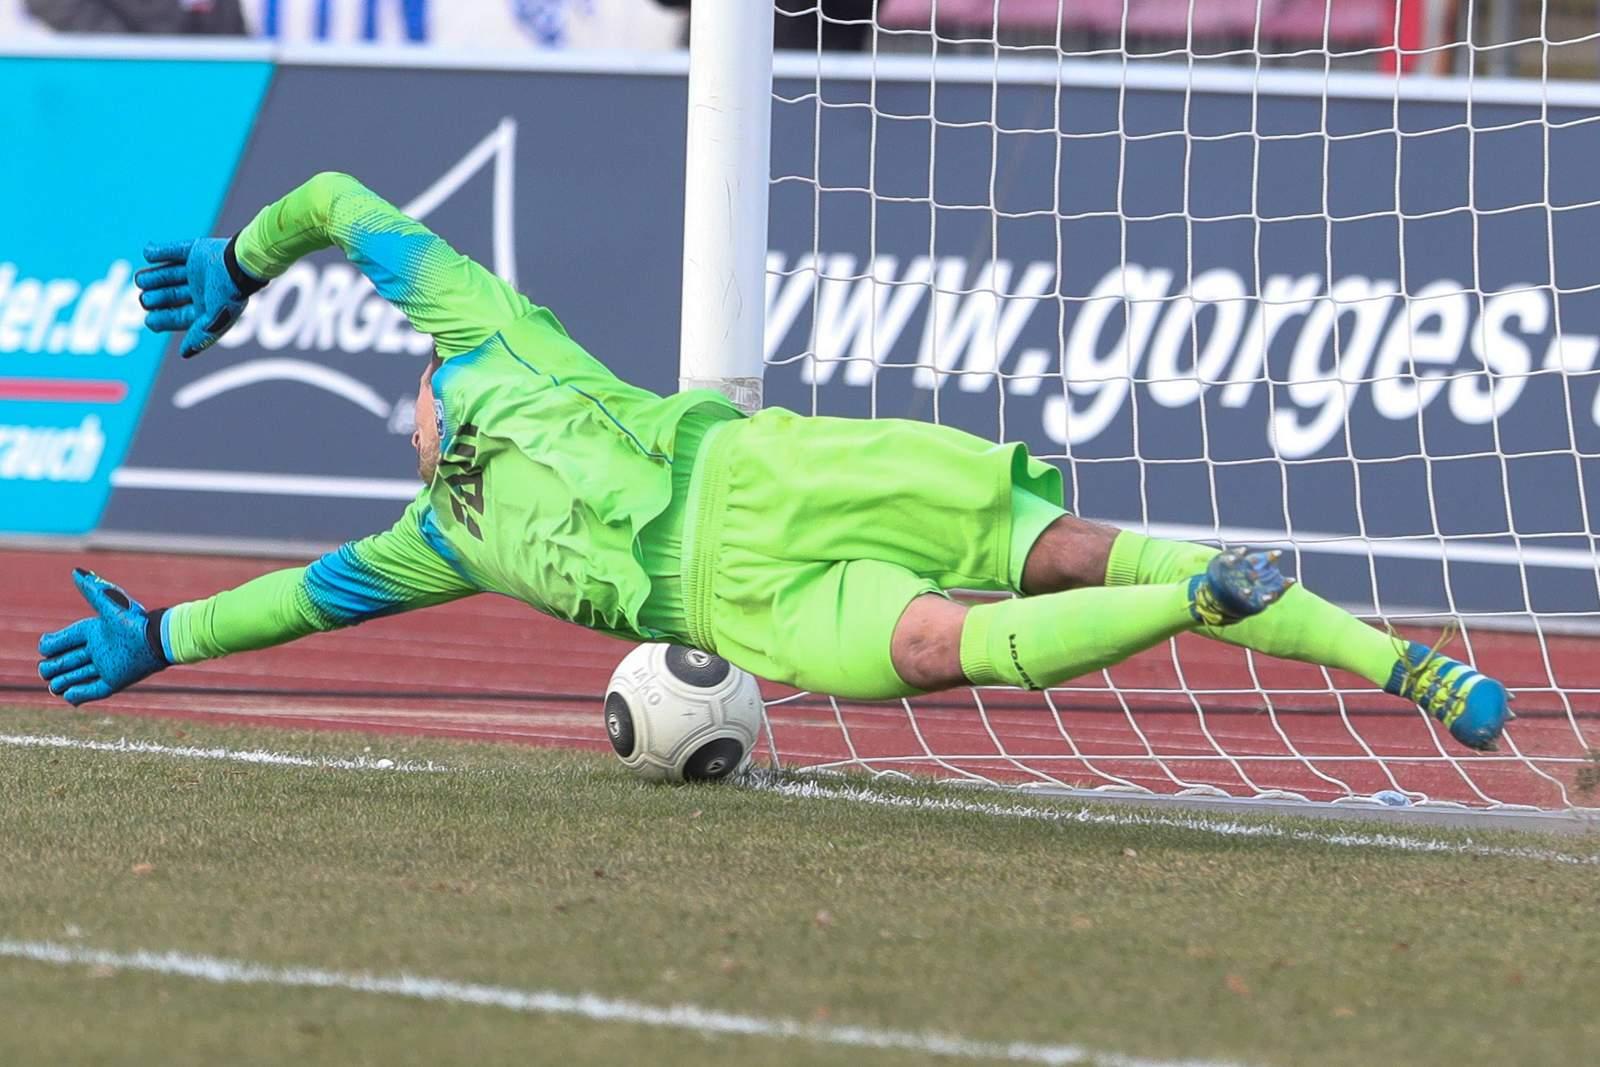 Leopold Zingerle kassiert Eigentor gegen Fortuna Köln